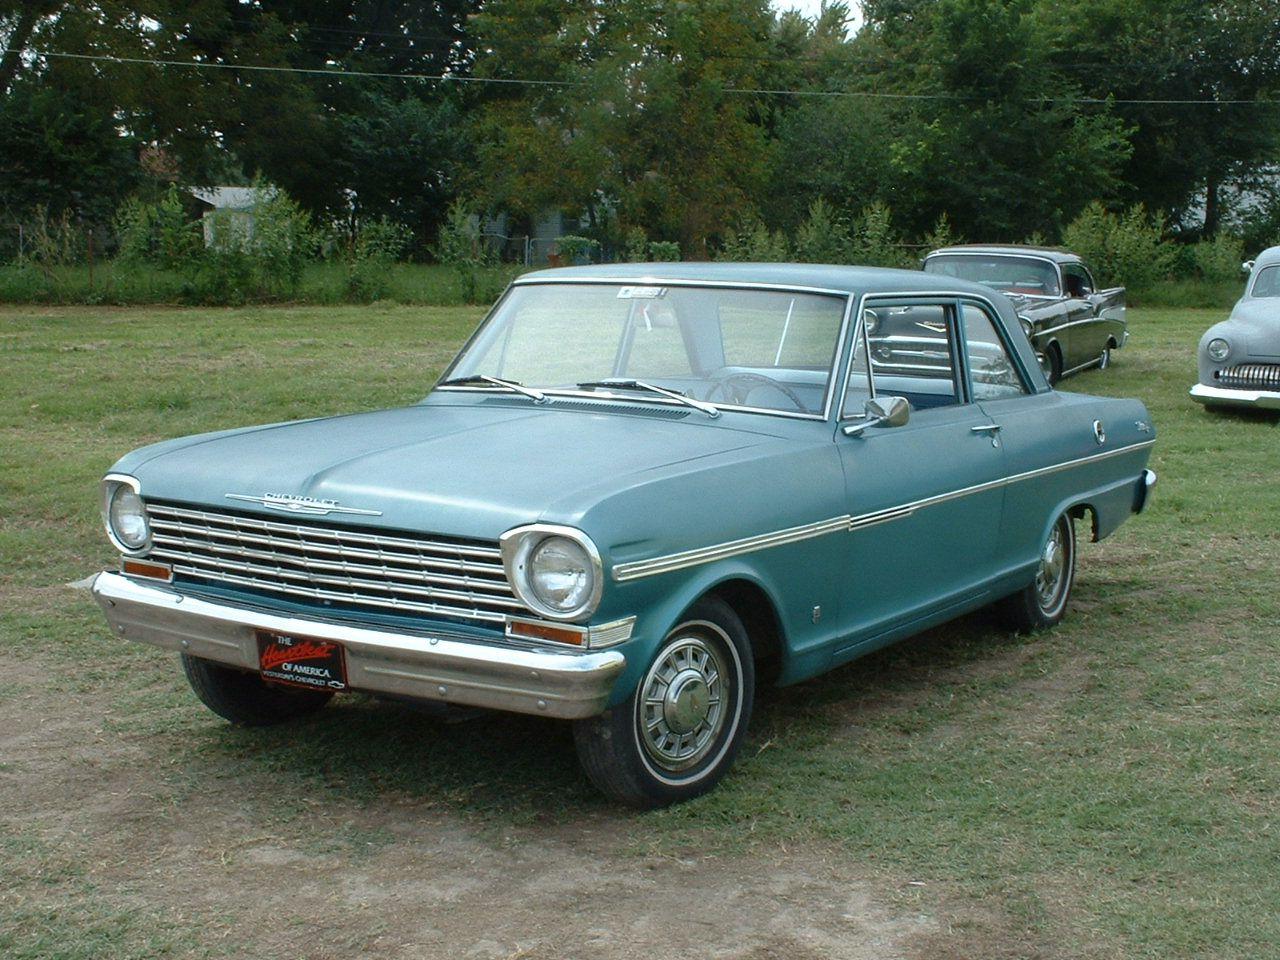 All Chevy 64 chevy nova : 62 best Nova images on Pinterest | Chevy nova, Station wagon and ...